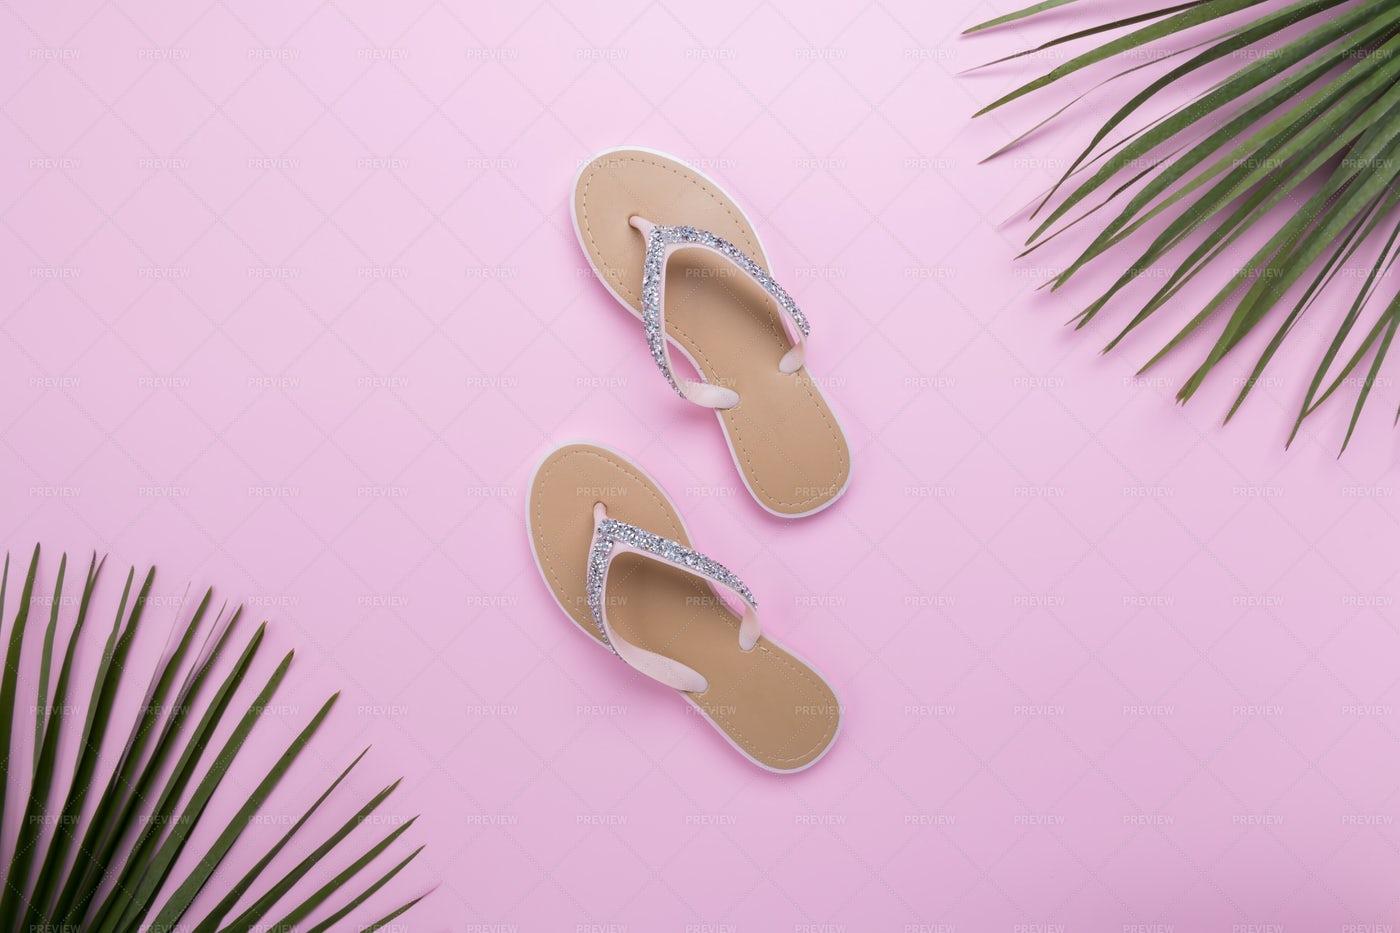 Beach Flip-Flops Against Pink: Stock Photos